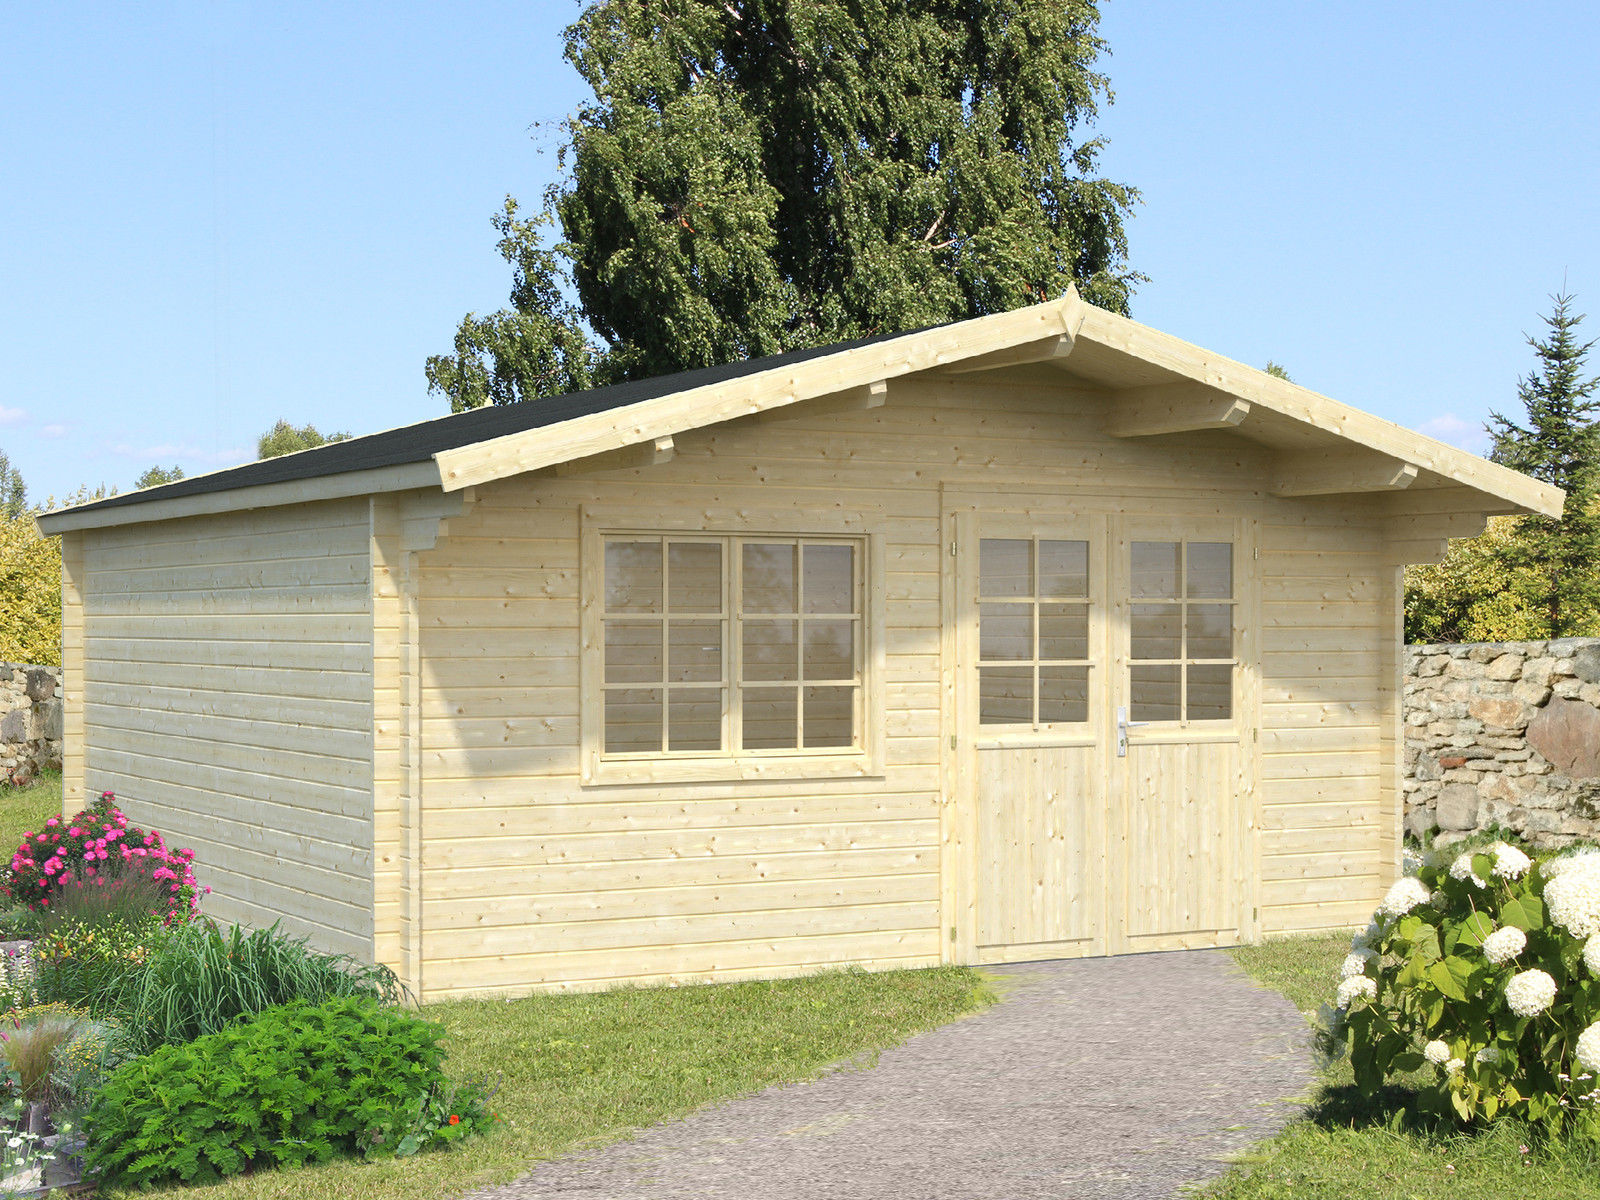 gartenhaus maria 4 40mm cm holzwurm obersayn. Black Bedroom Furniture Sets. Home Design Ideas